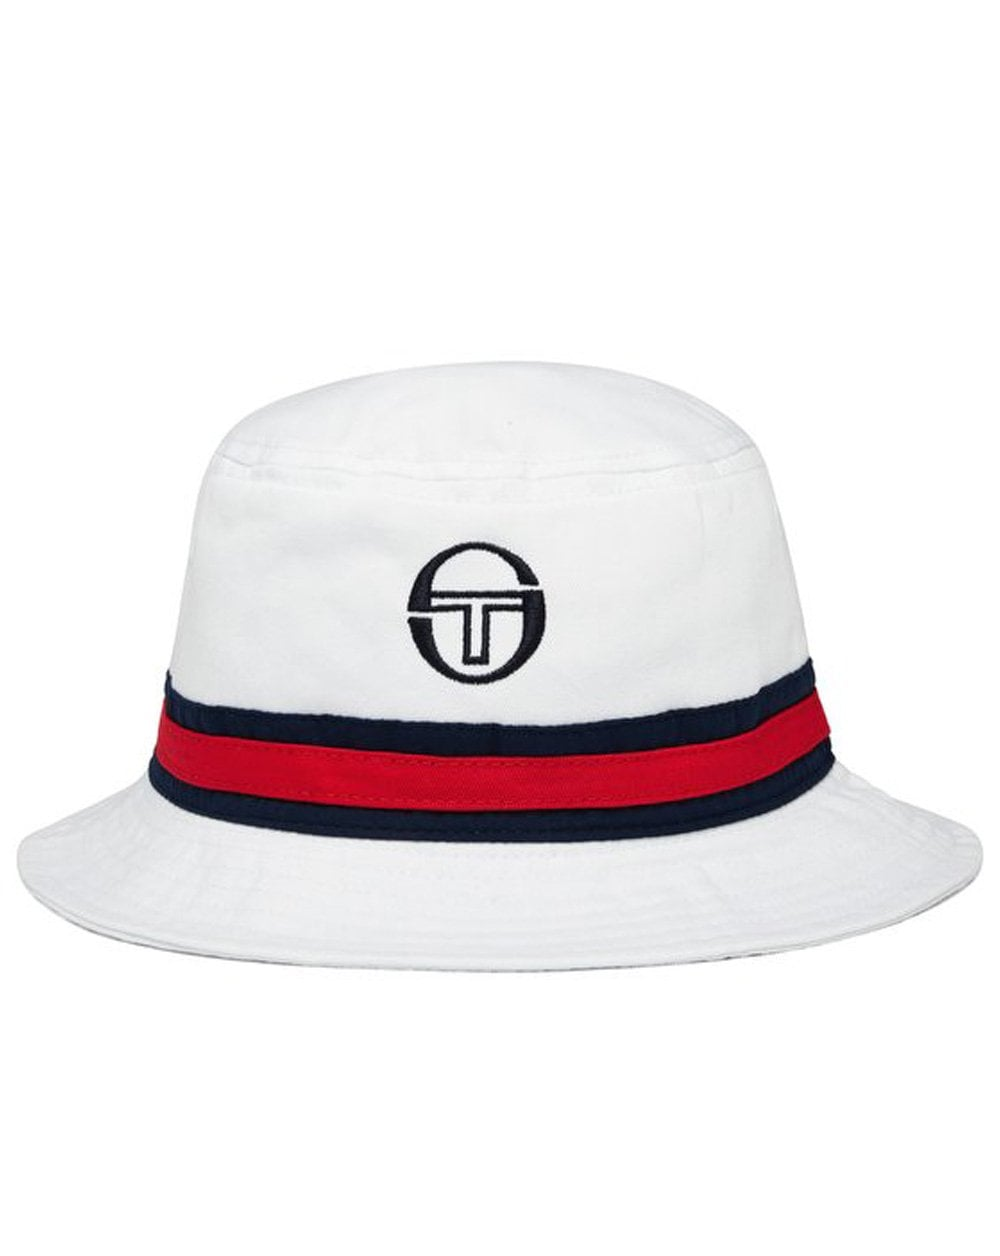 0a2c239eed3 Sergio Tacchini Sergio Tacchini Ivo Bucket Hat White navy